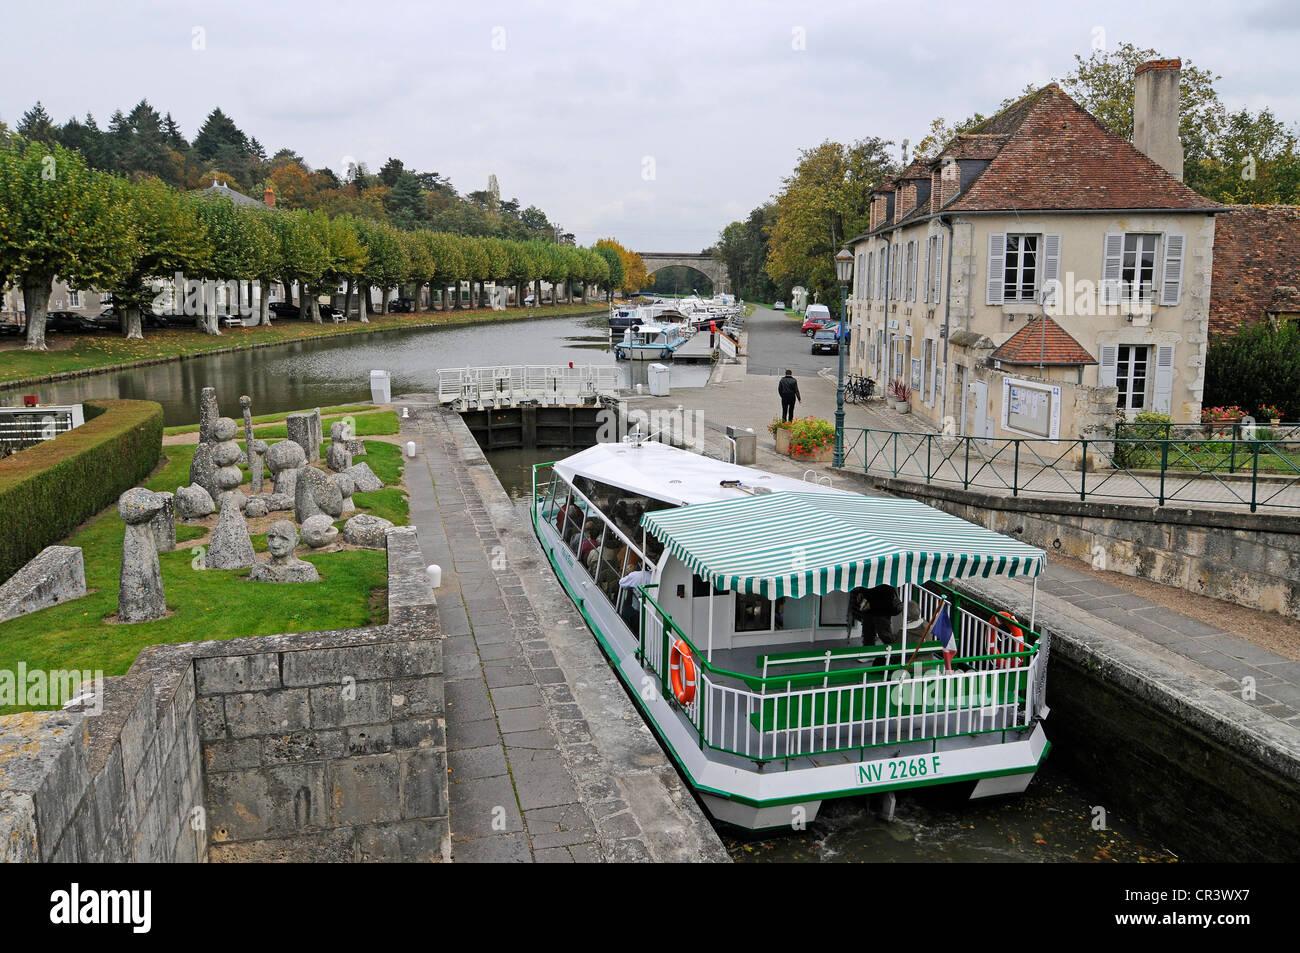 Ship in the lock, Canal latéral à la Loire, Loire side channel, Briare, Loiret, Centre, France, Europe, - Stock Image